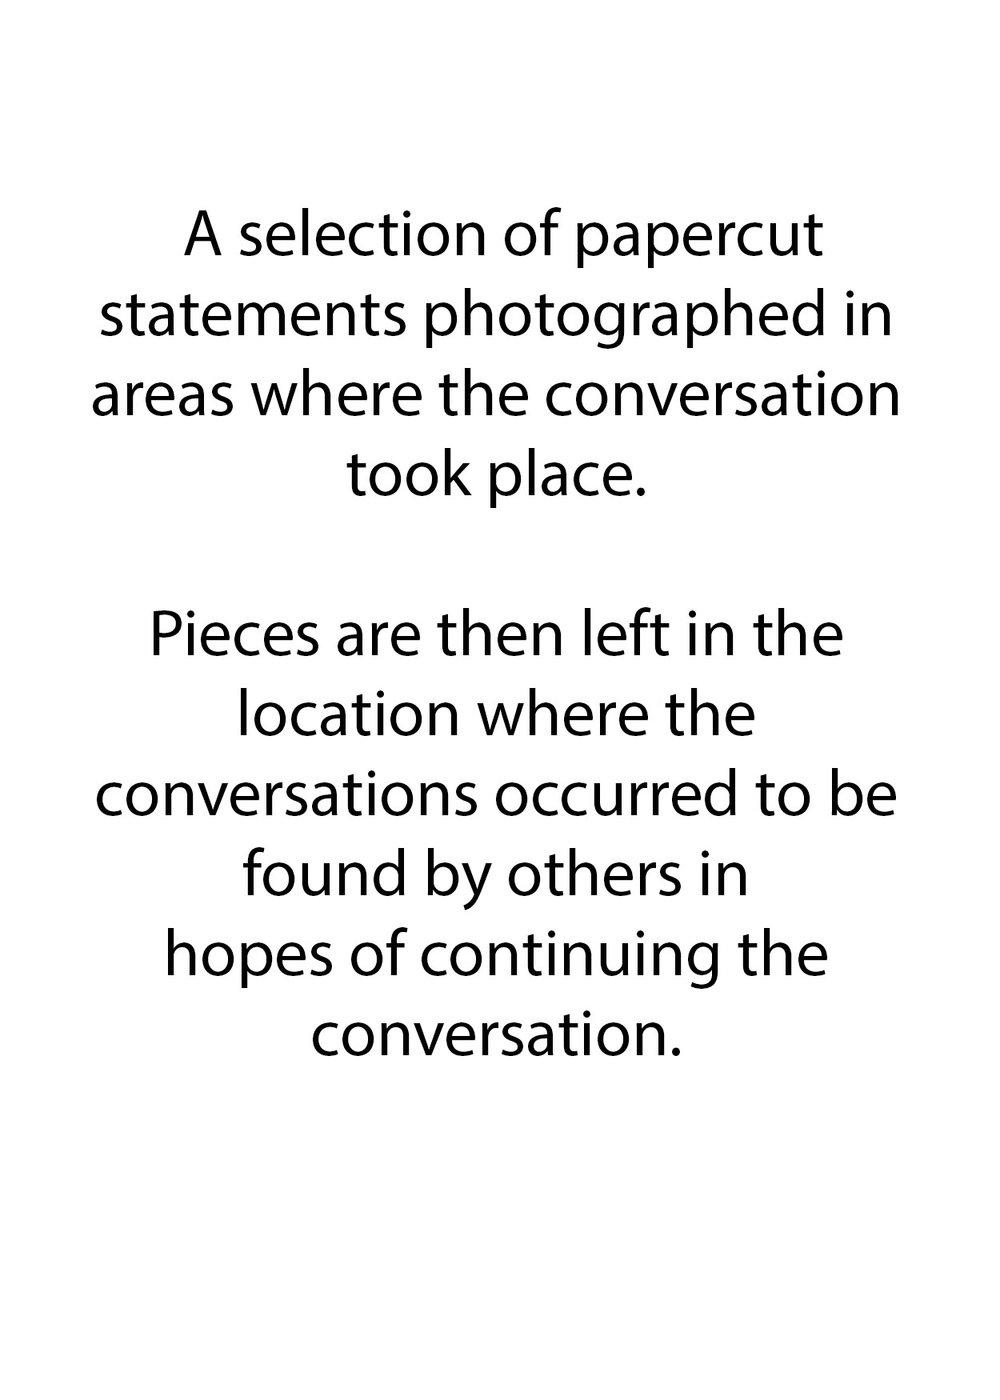 papercutstatements description.jpg